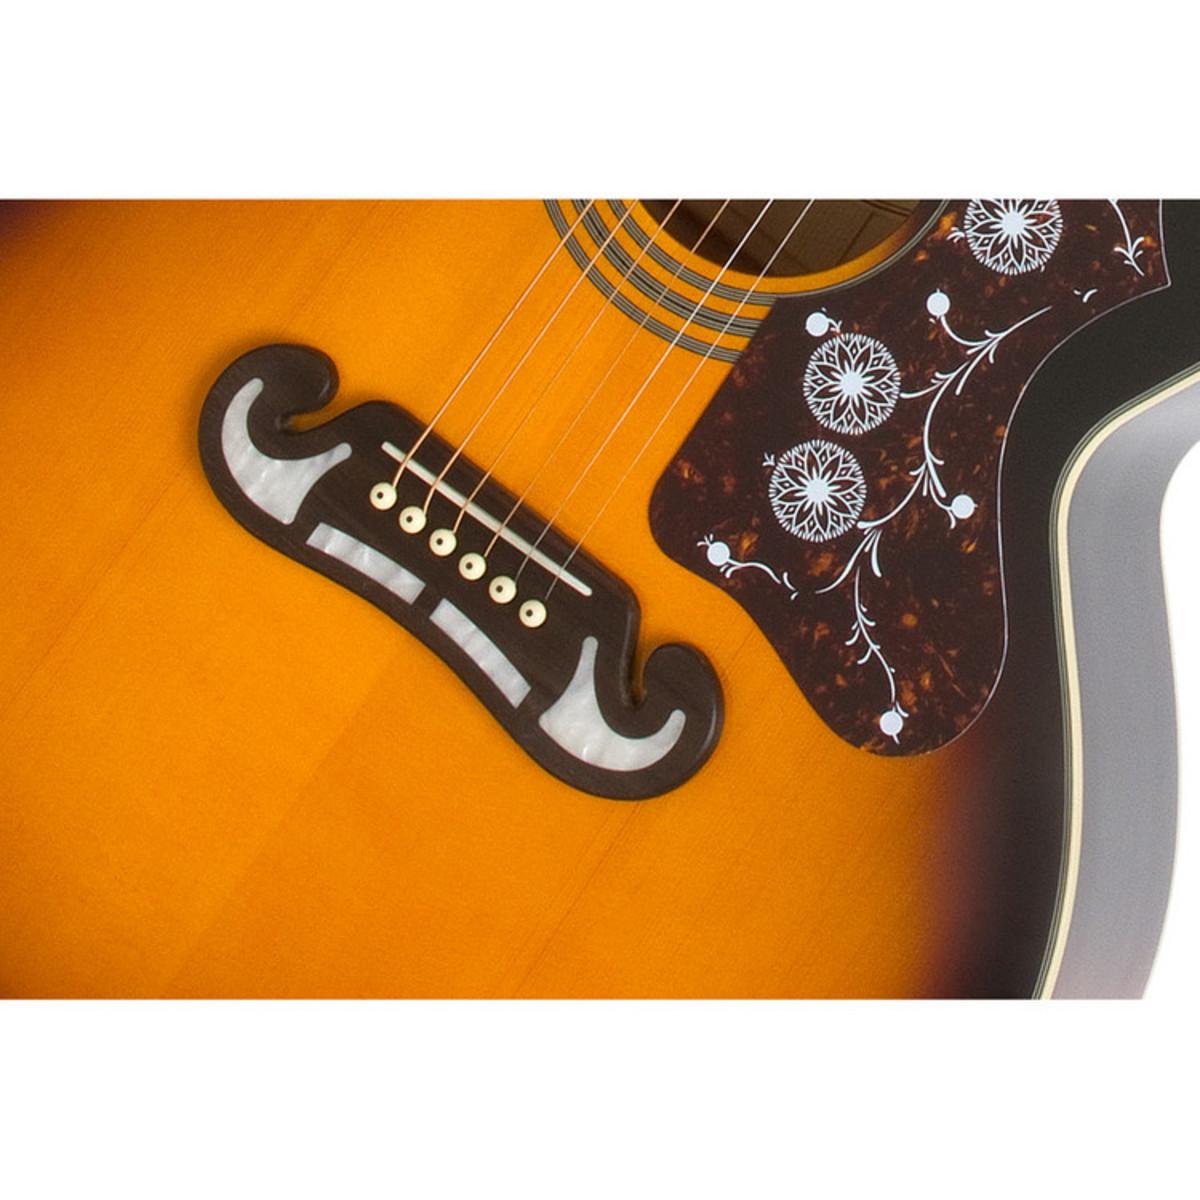 epiphone ej 200ce guitare electro acoustique vintage. Black Bedroom Furniture Sets. Home Design Ideas